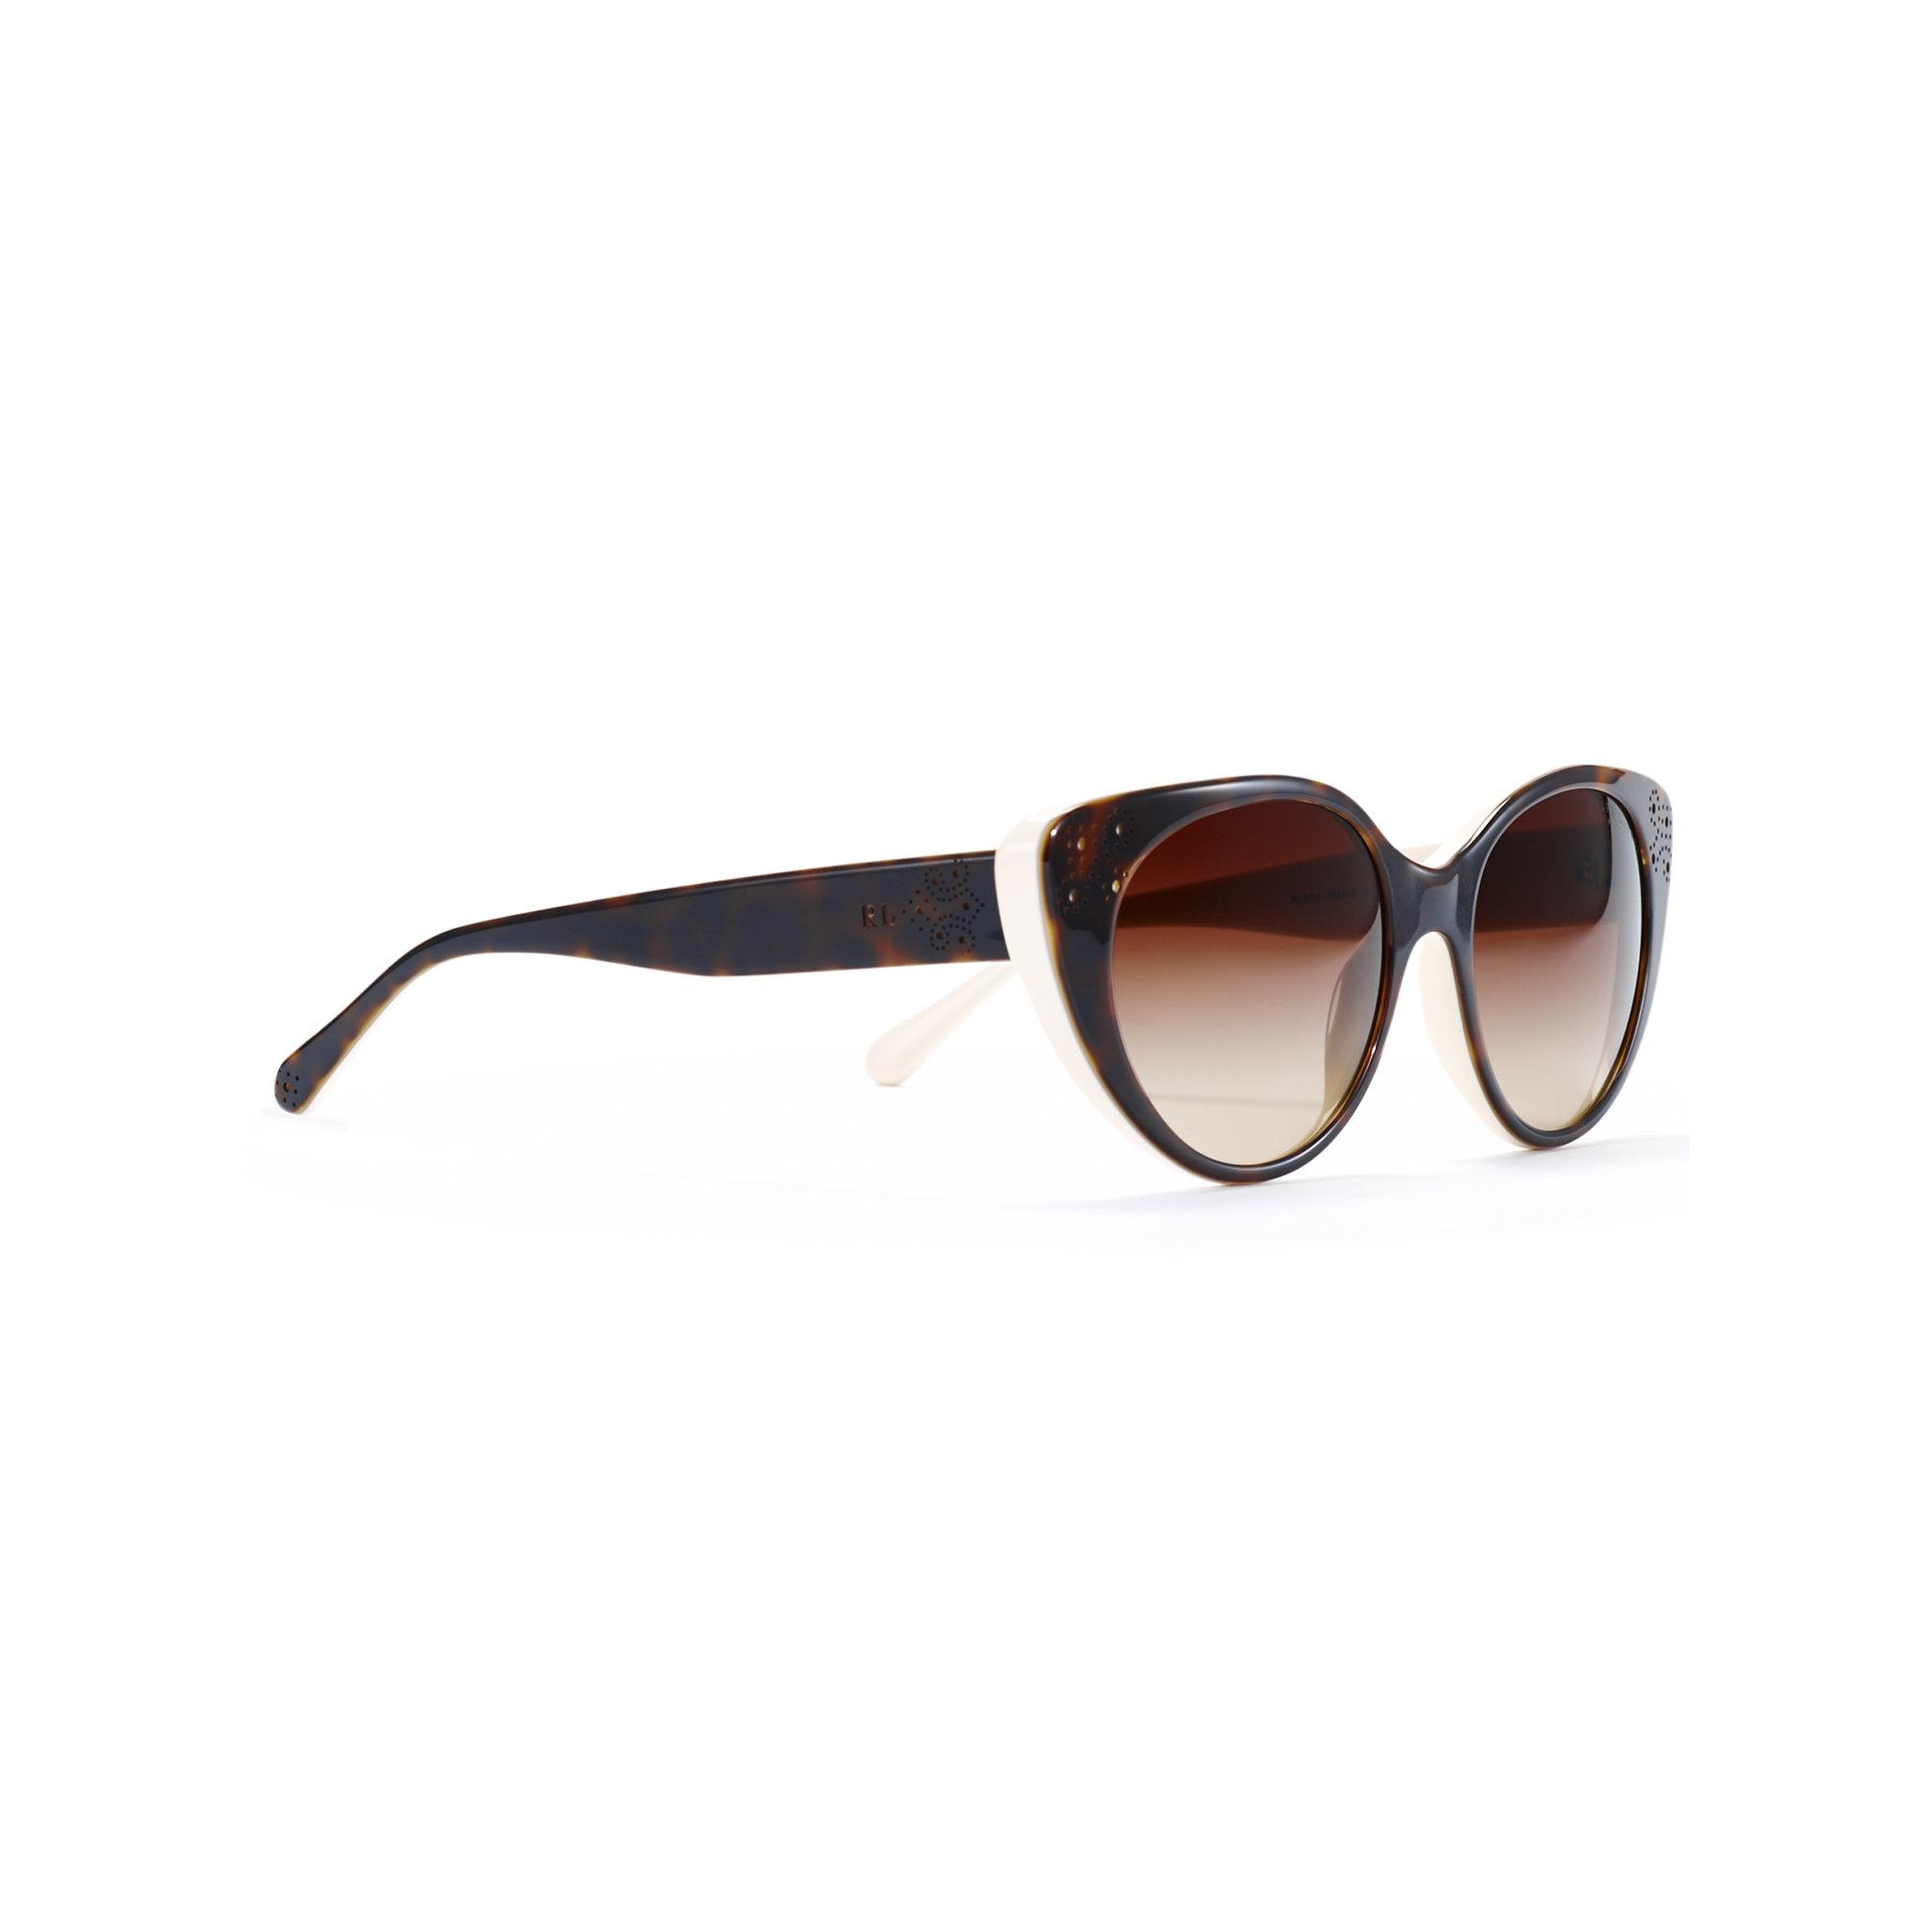 af360898237 Ralph Lauren Women s Polarized Cat Eye Sunglasses